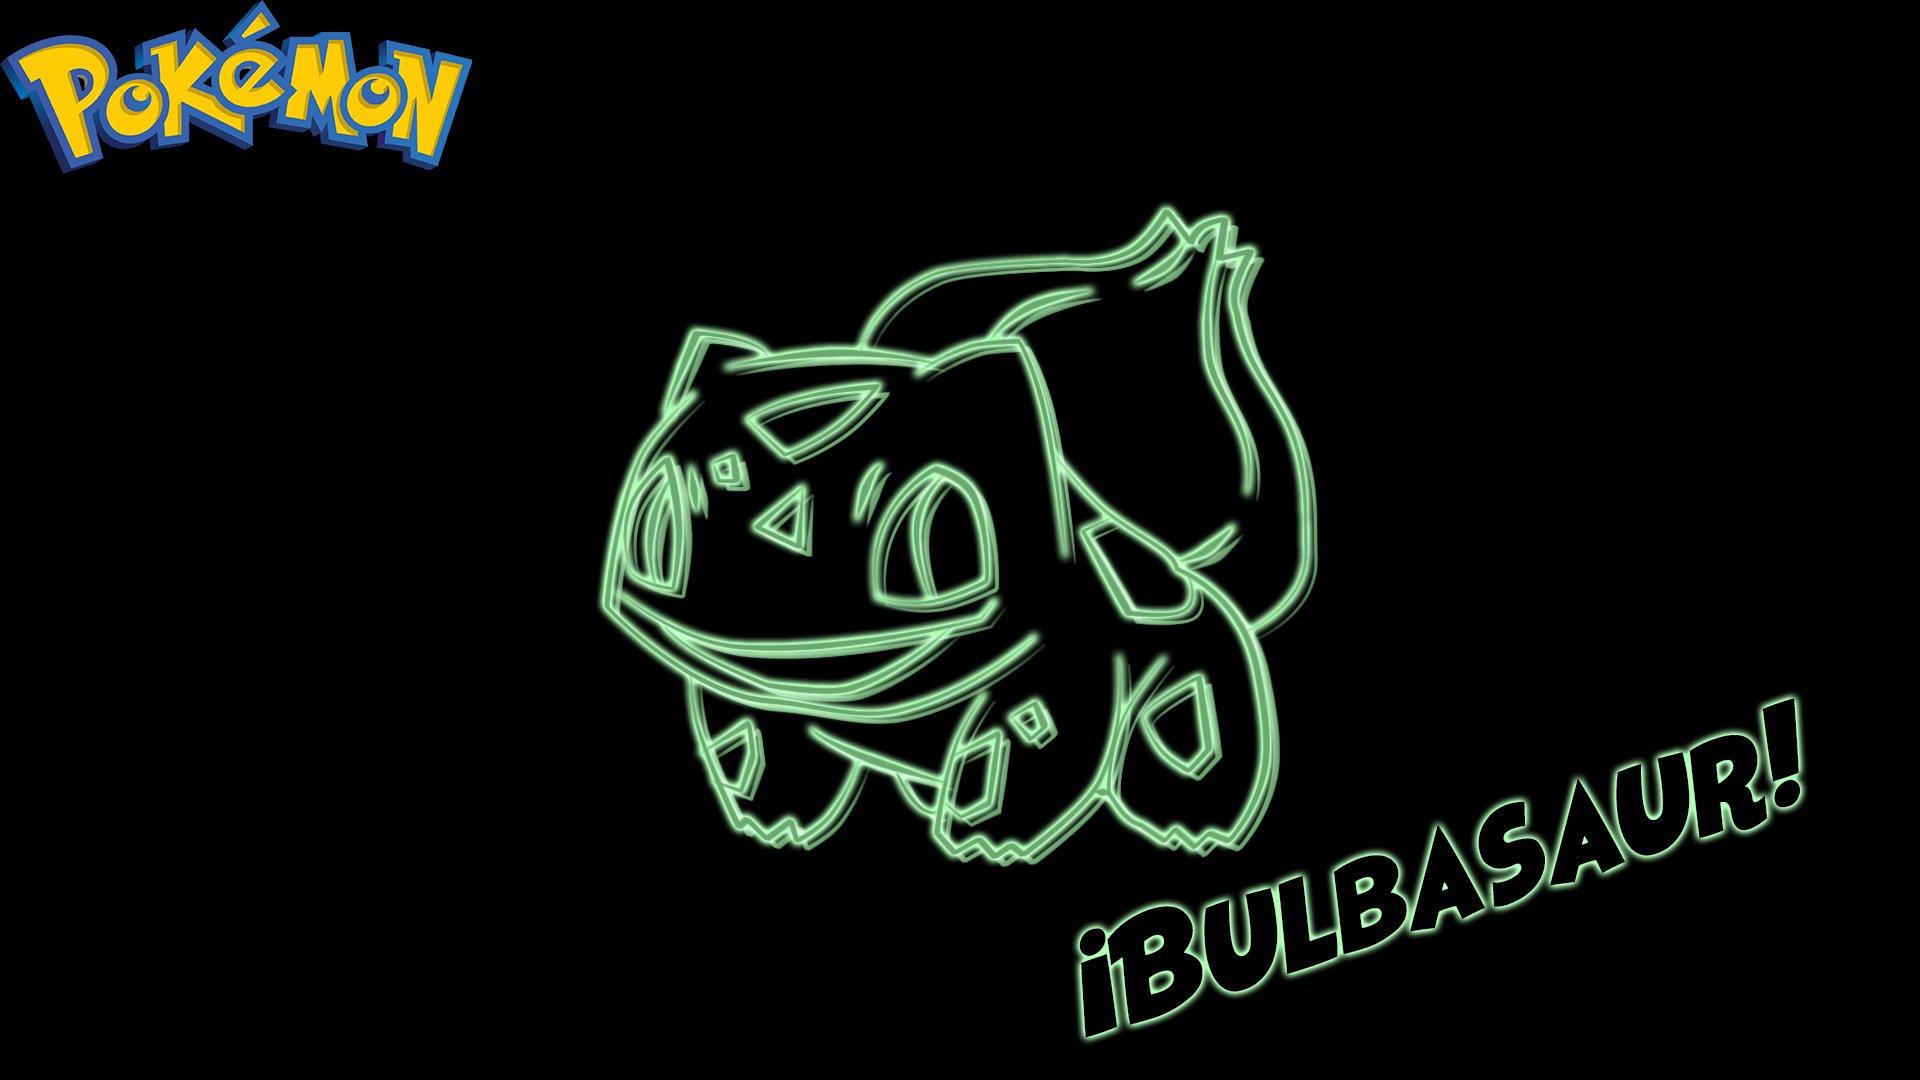 Video Game - Pokémon  Bulbasaur (Pokémon) Neon Wallpaper